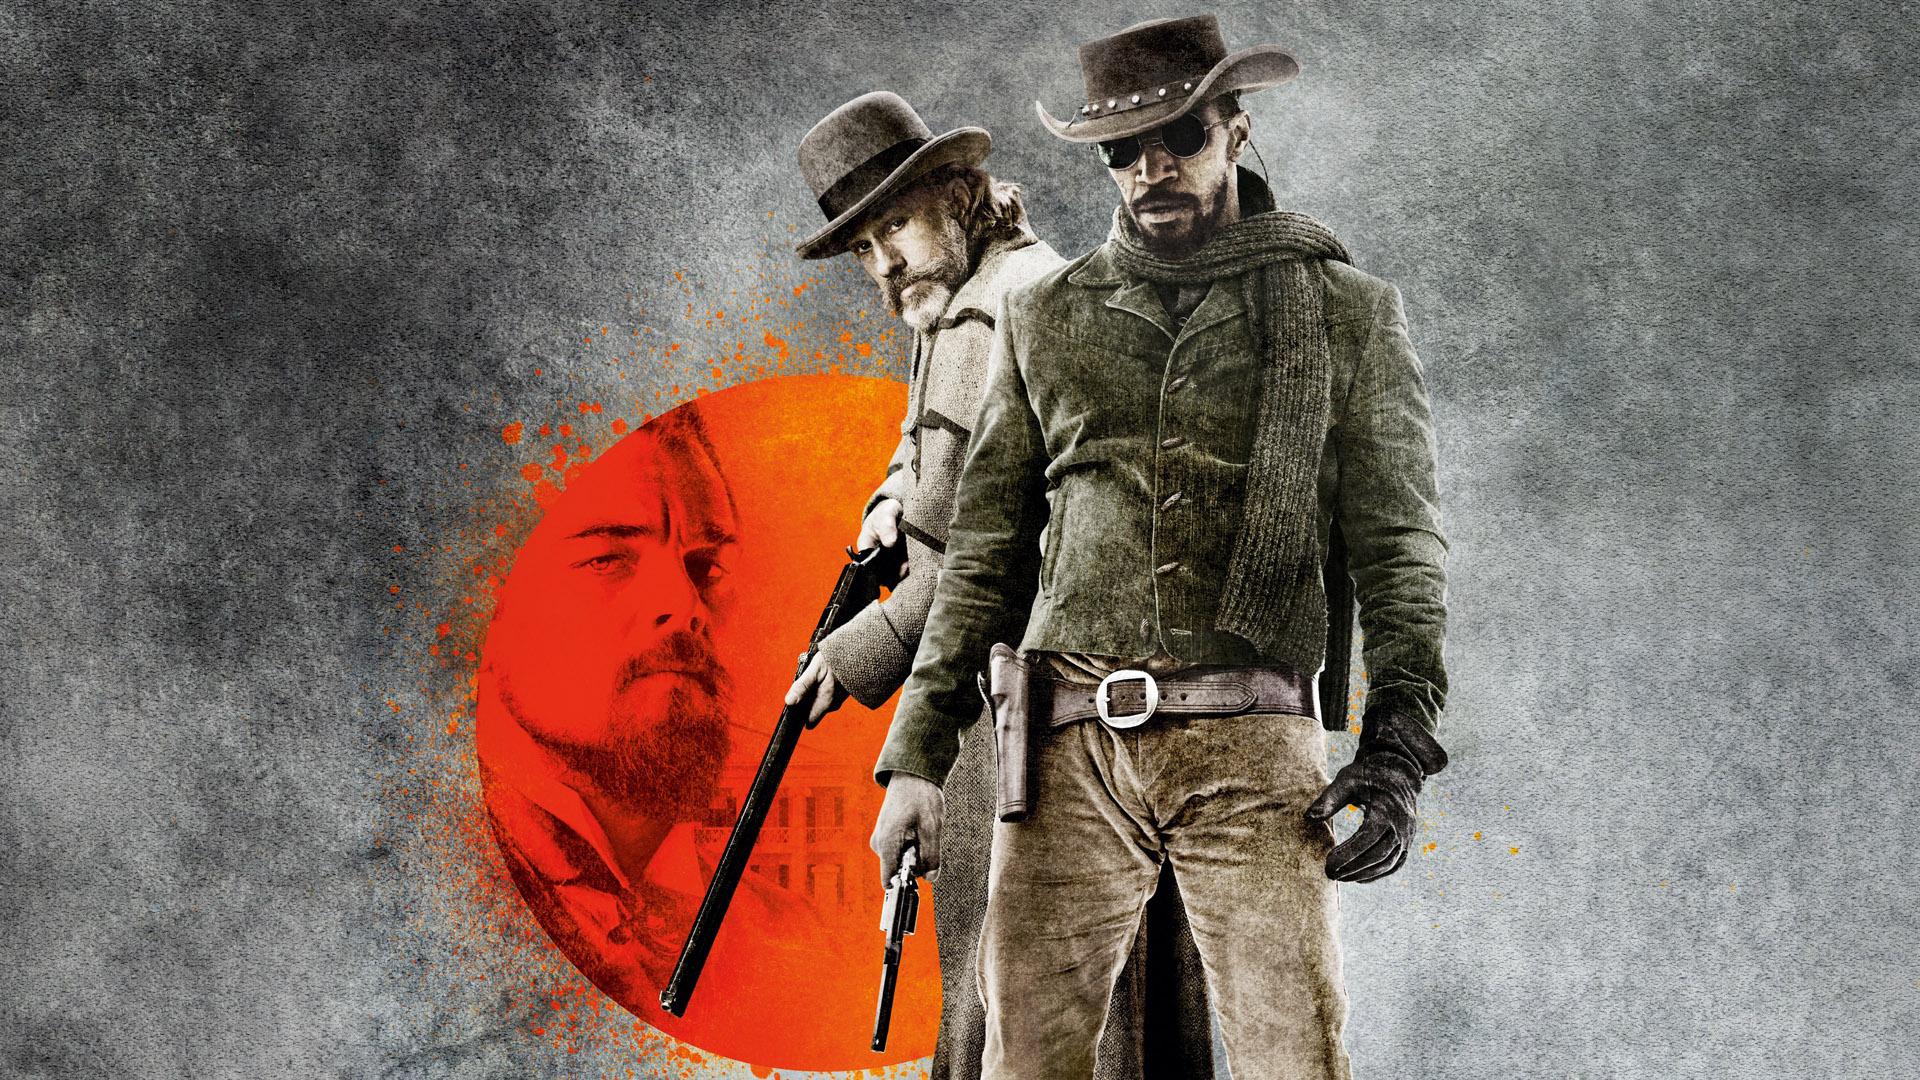 Background image django - Django Unchained Full Hd Wallpaper 1920x1080